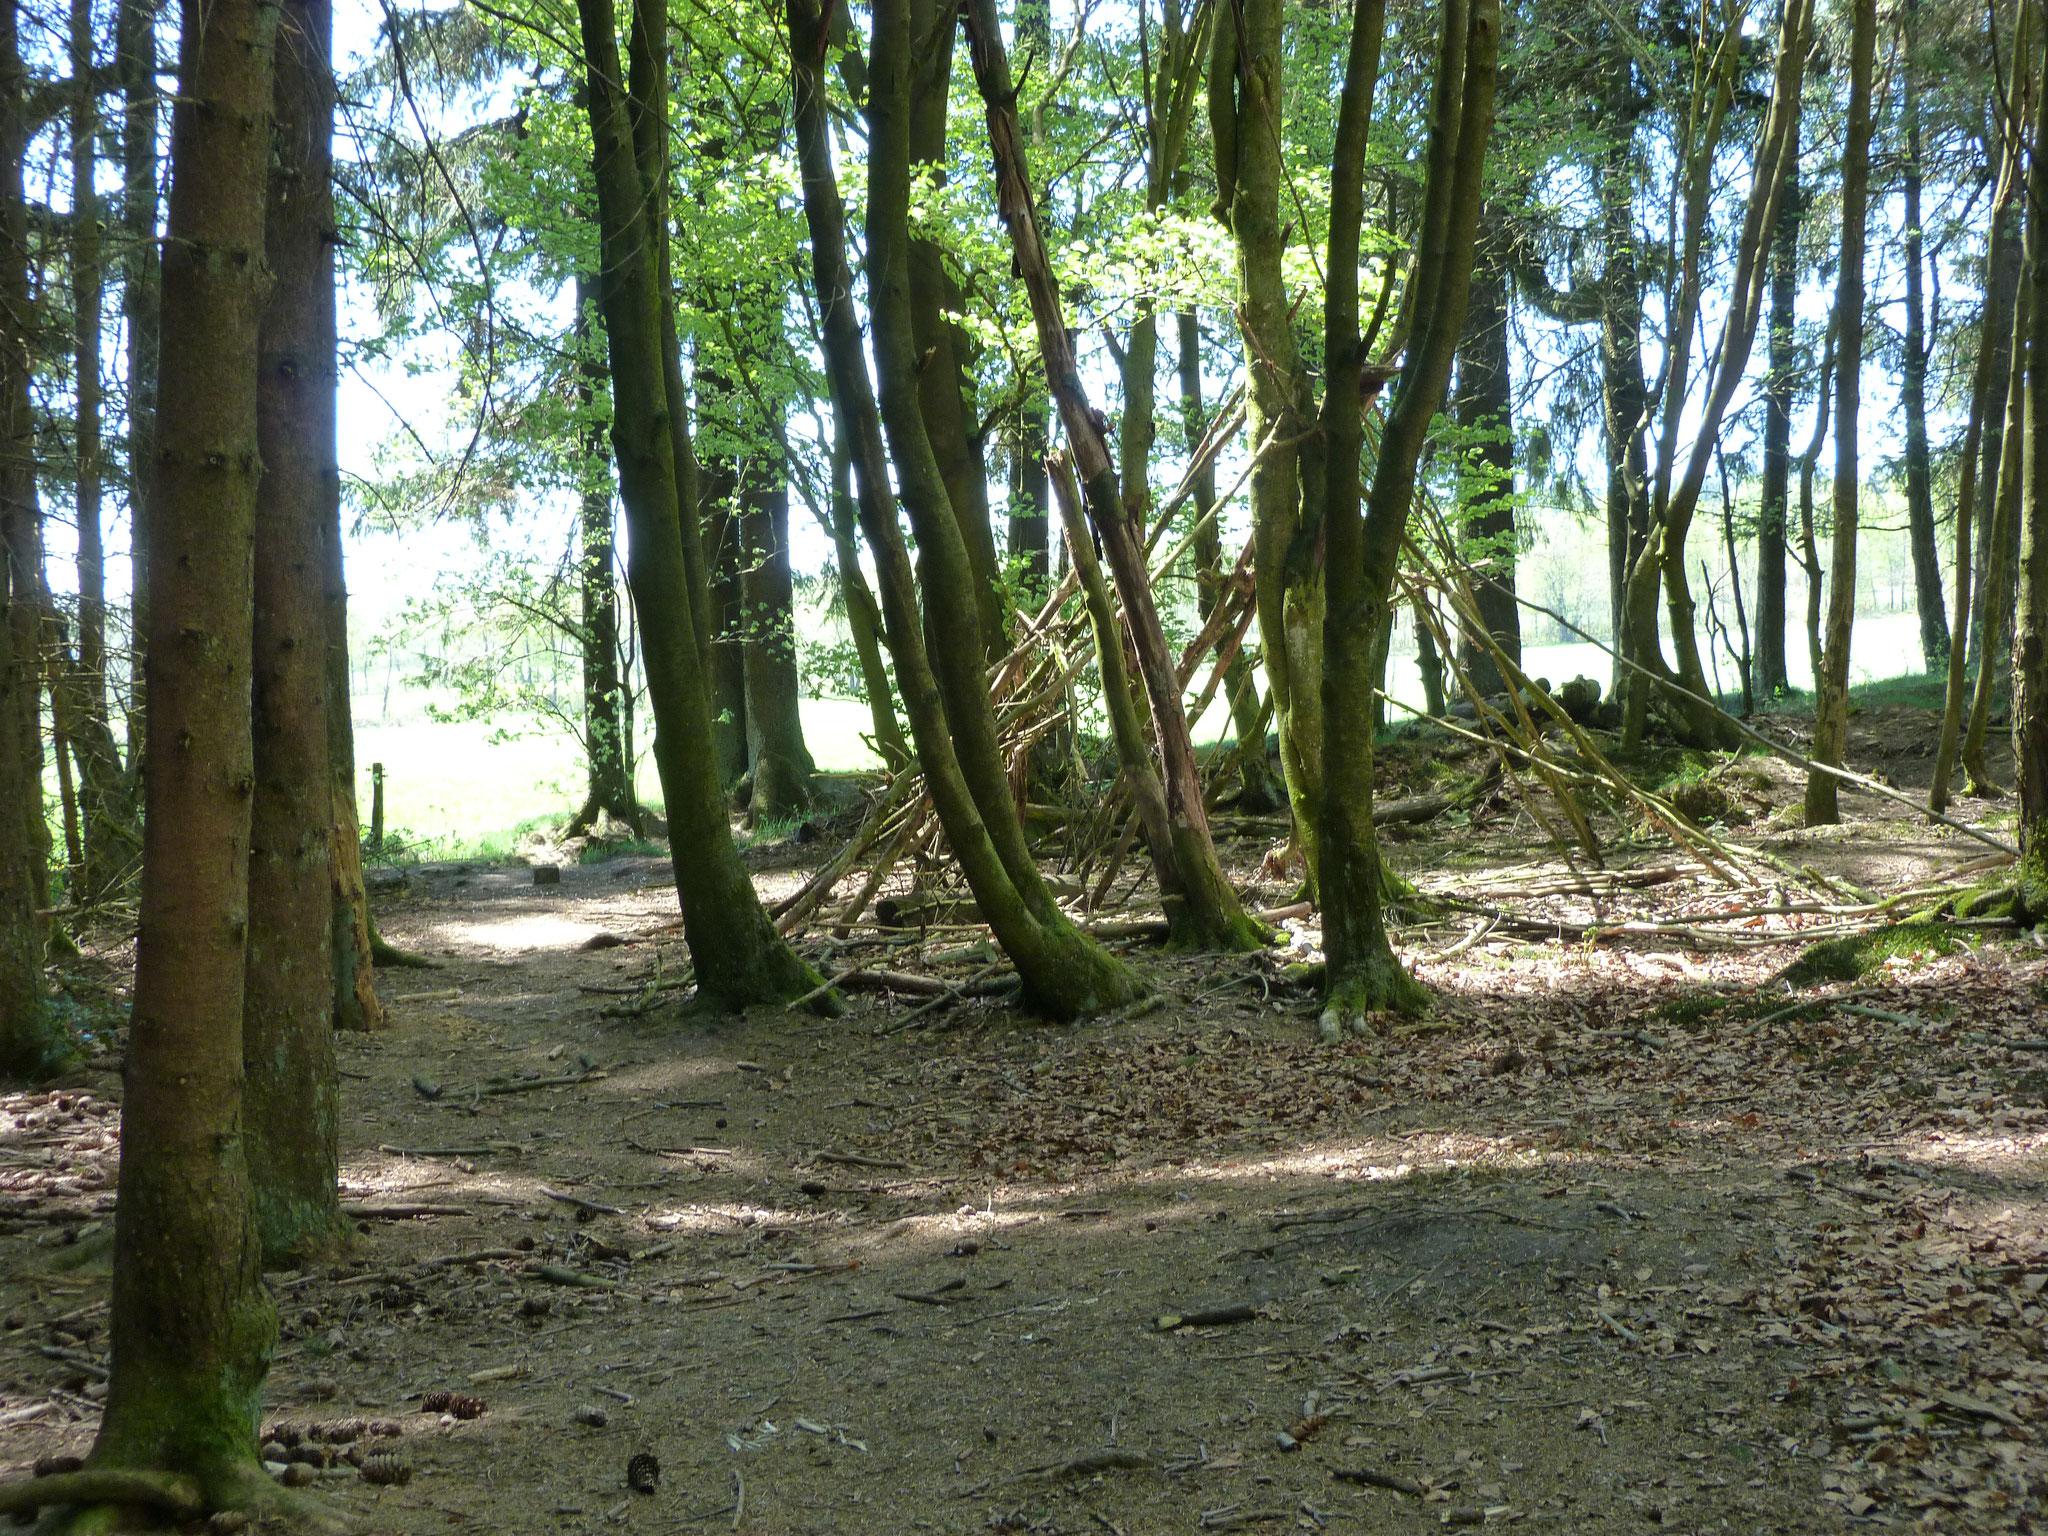 Abenteuer Wald